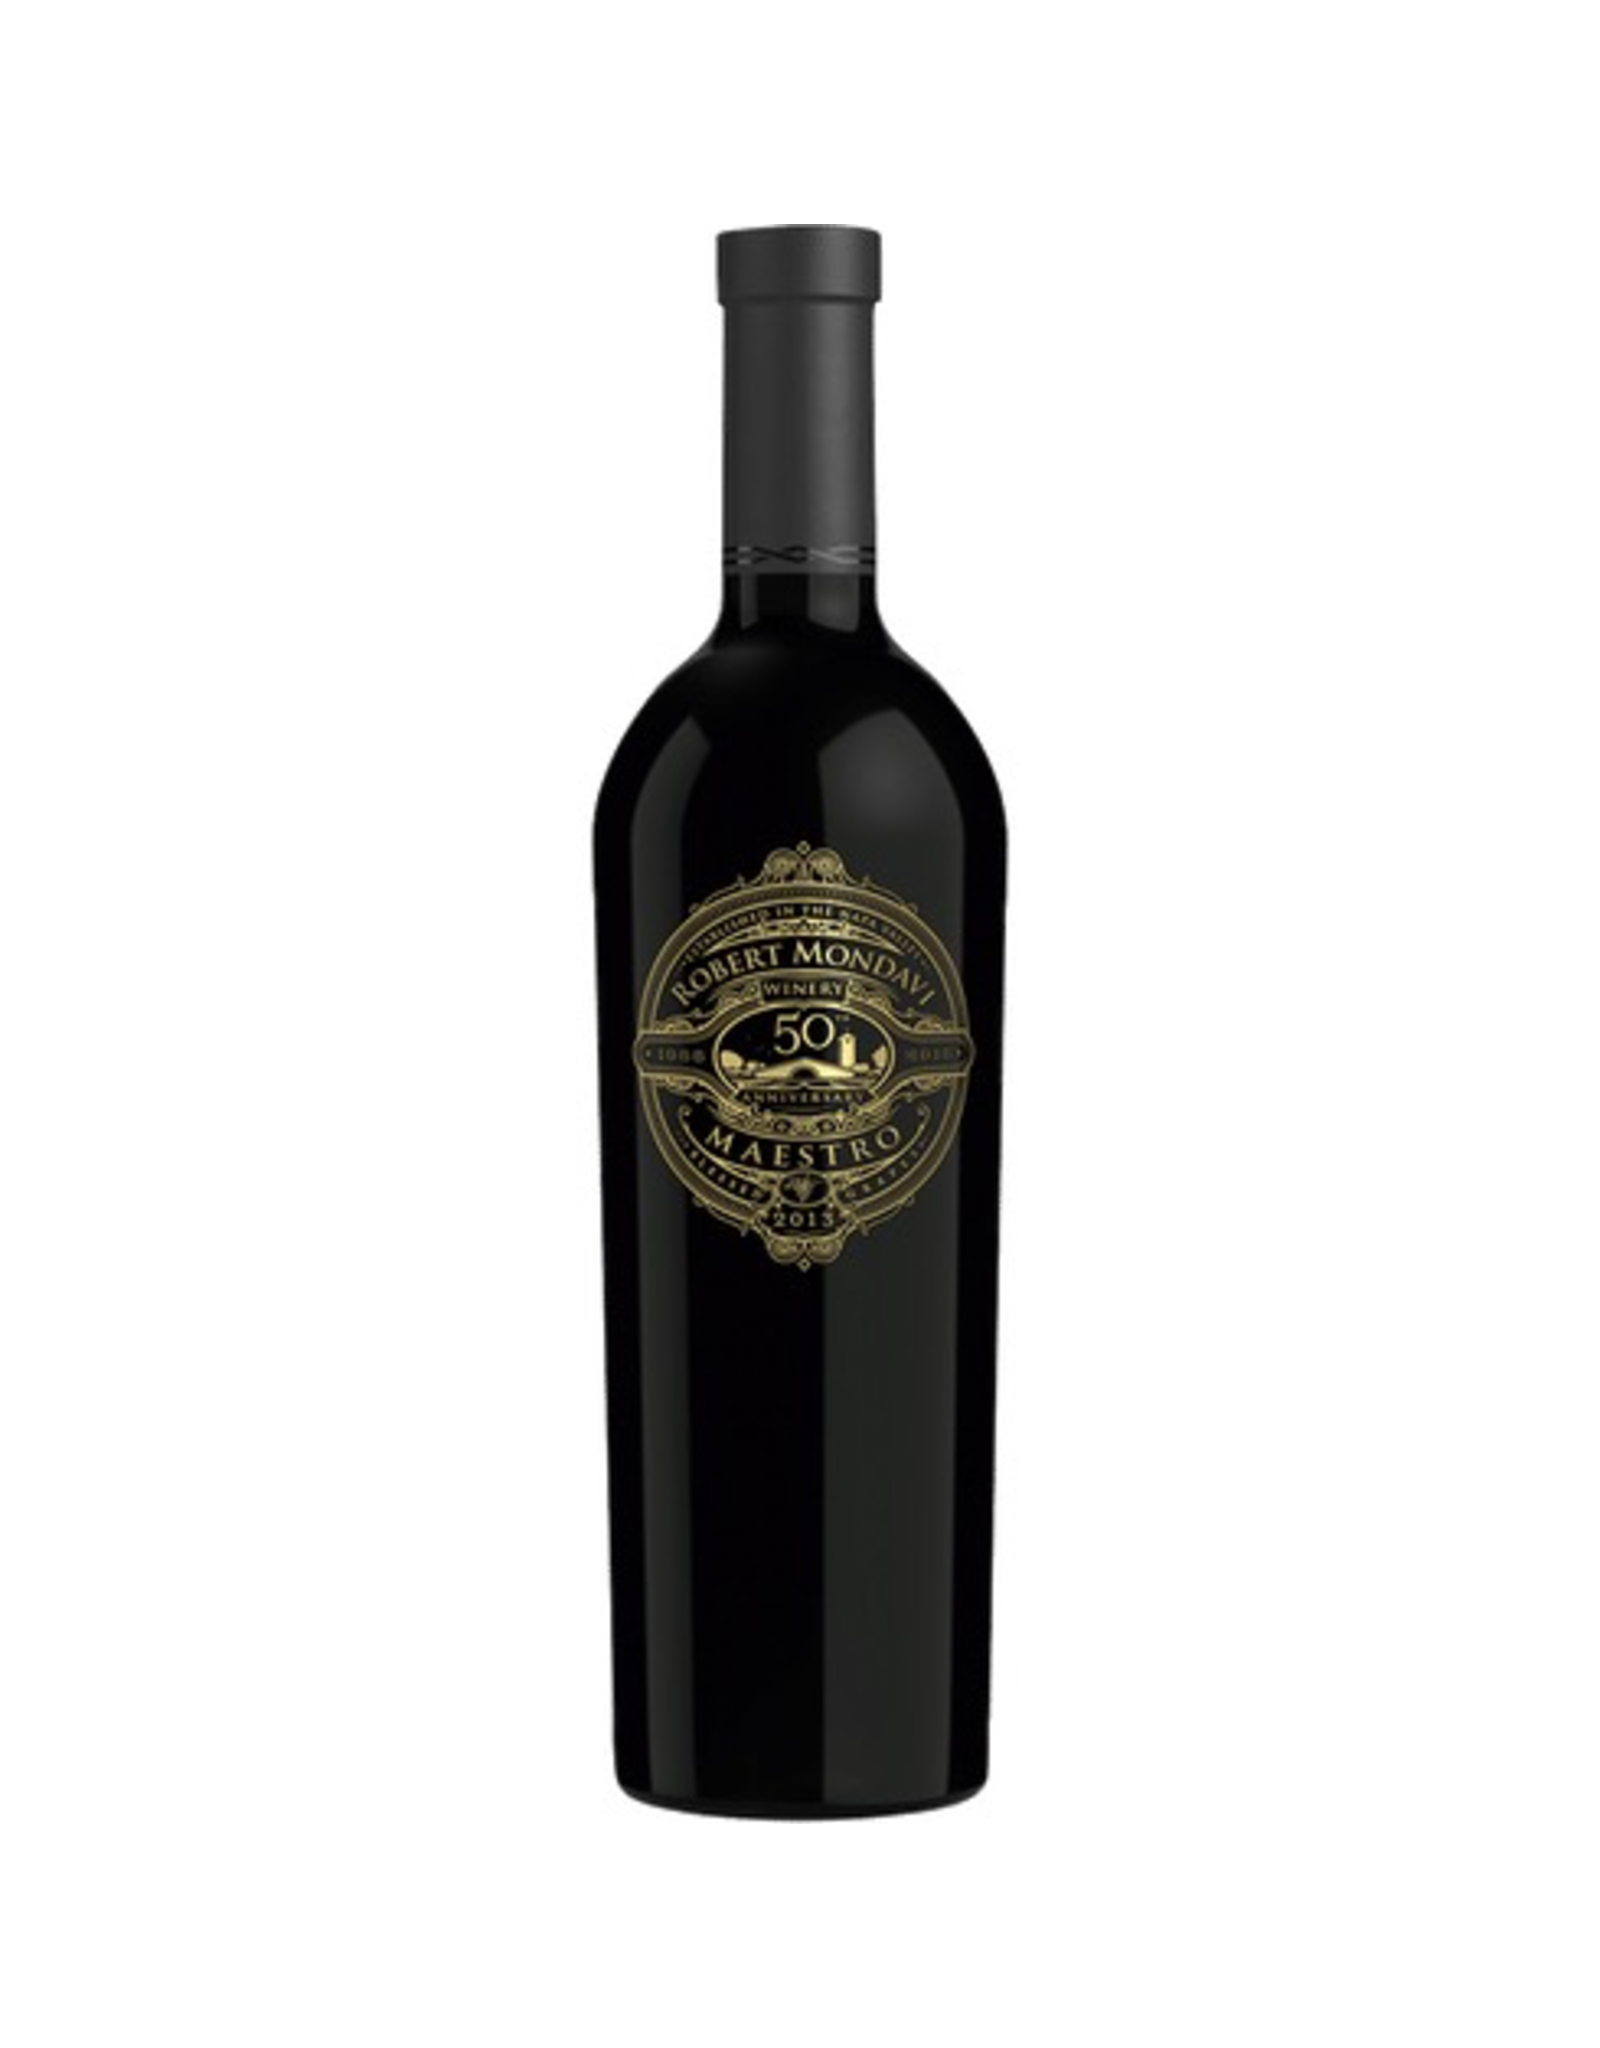 Red Wine 2018, Mondavi Maestro, Red Bordeaux Blend, Napa Valley, North Coast, California, 14.5% Alc, CTnr, TW93